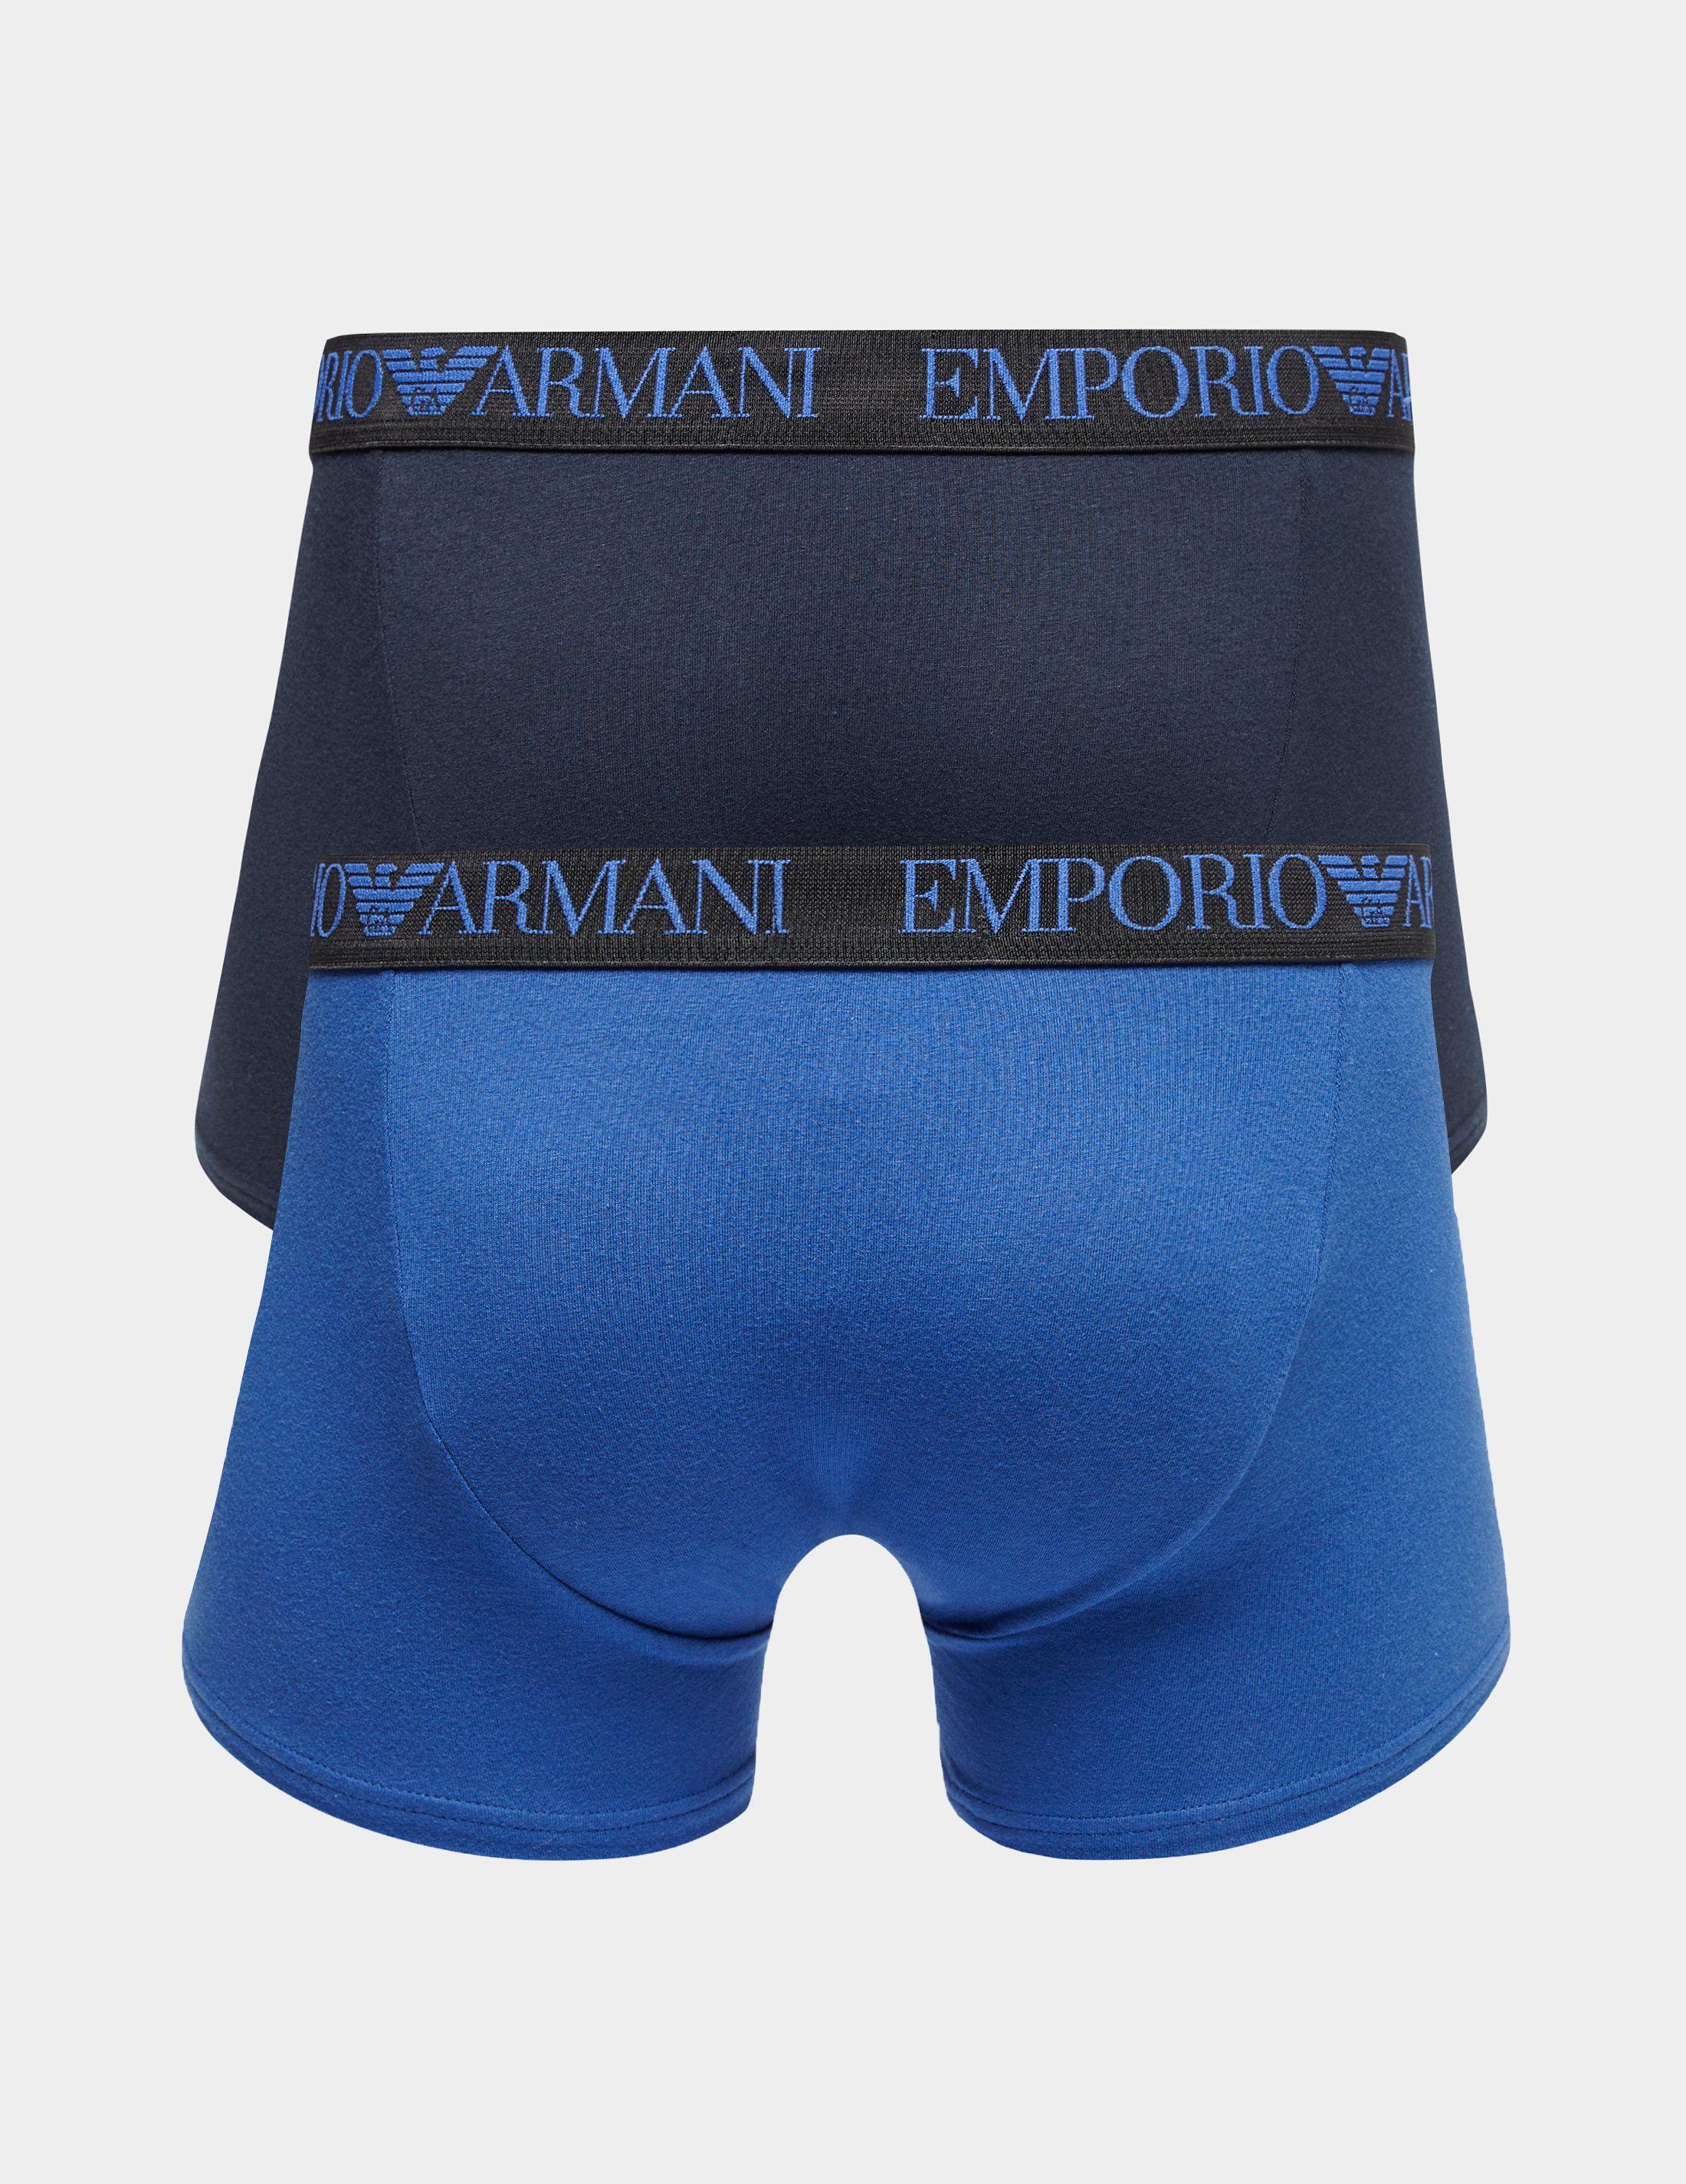 Emporio Armani 2-Pack Endurance Boxer Shorts